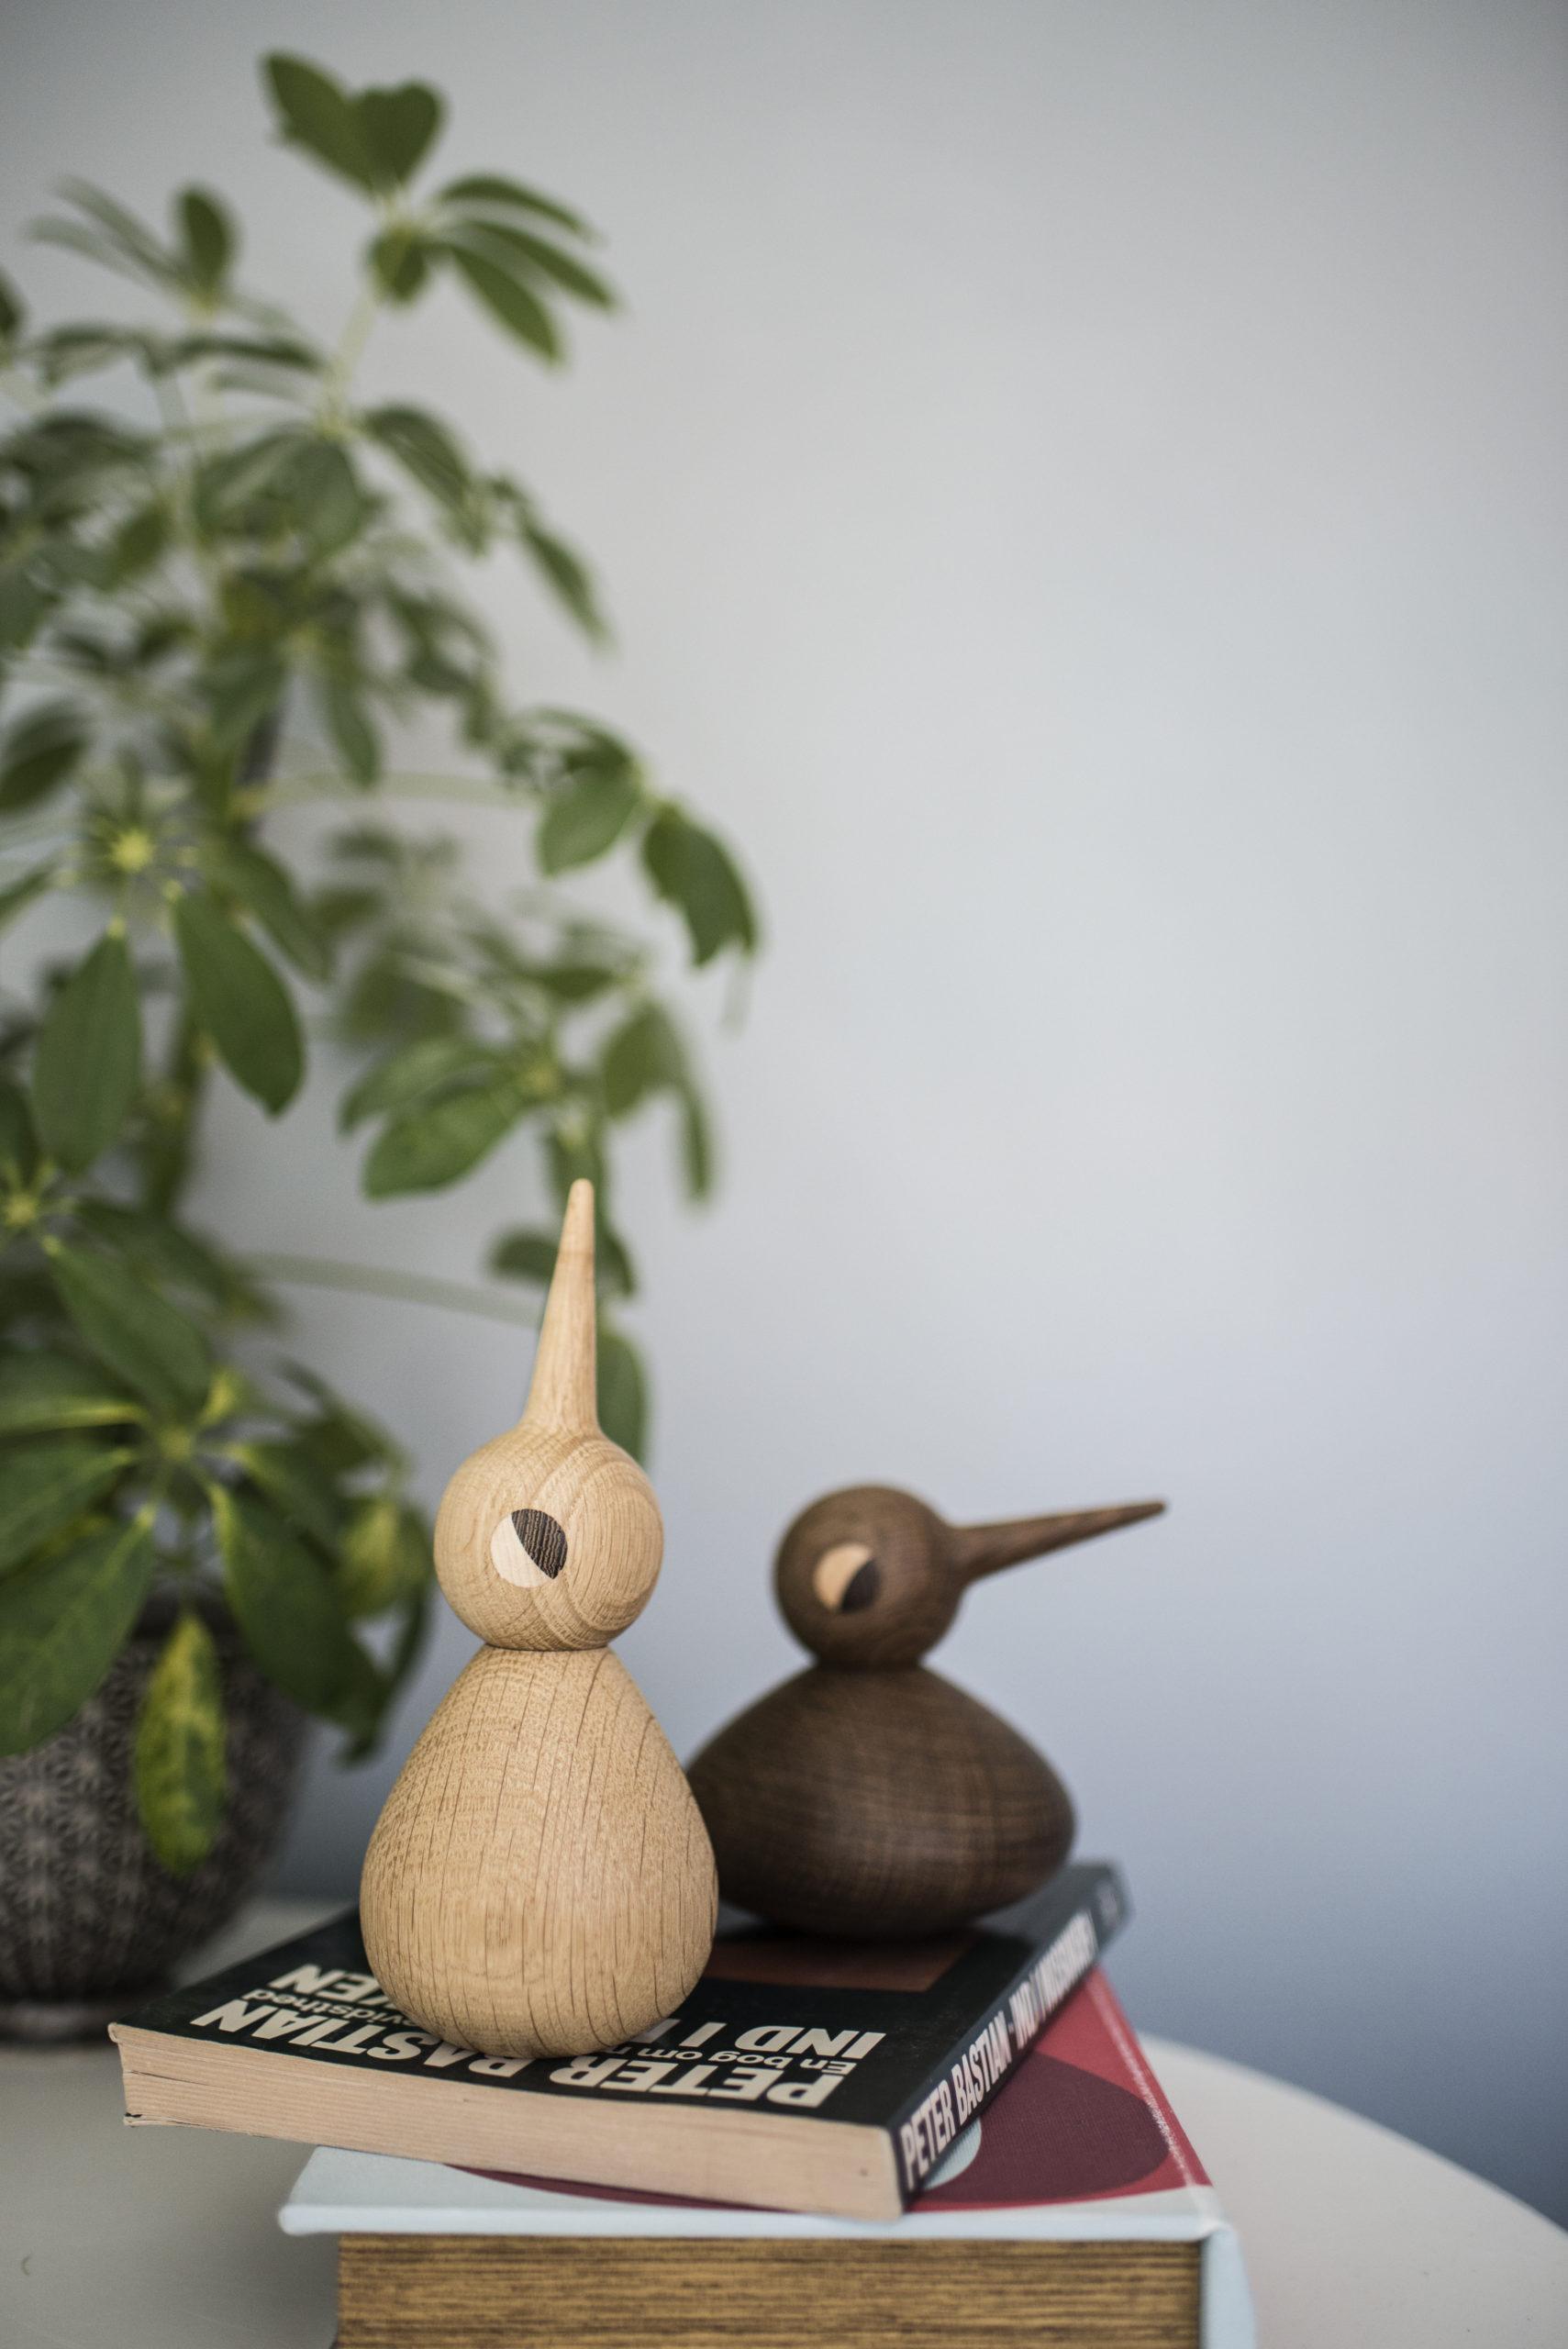 Architectmade-Bird-Oak-Wood-Denmark-Kristian-Vedel-3